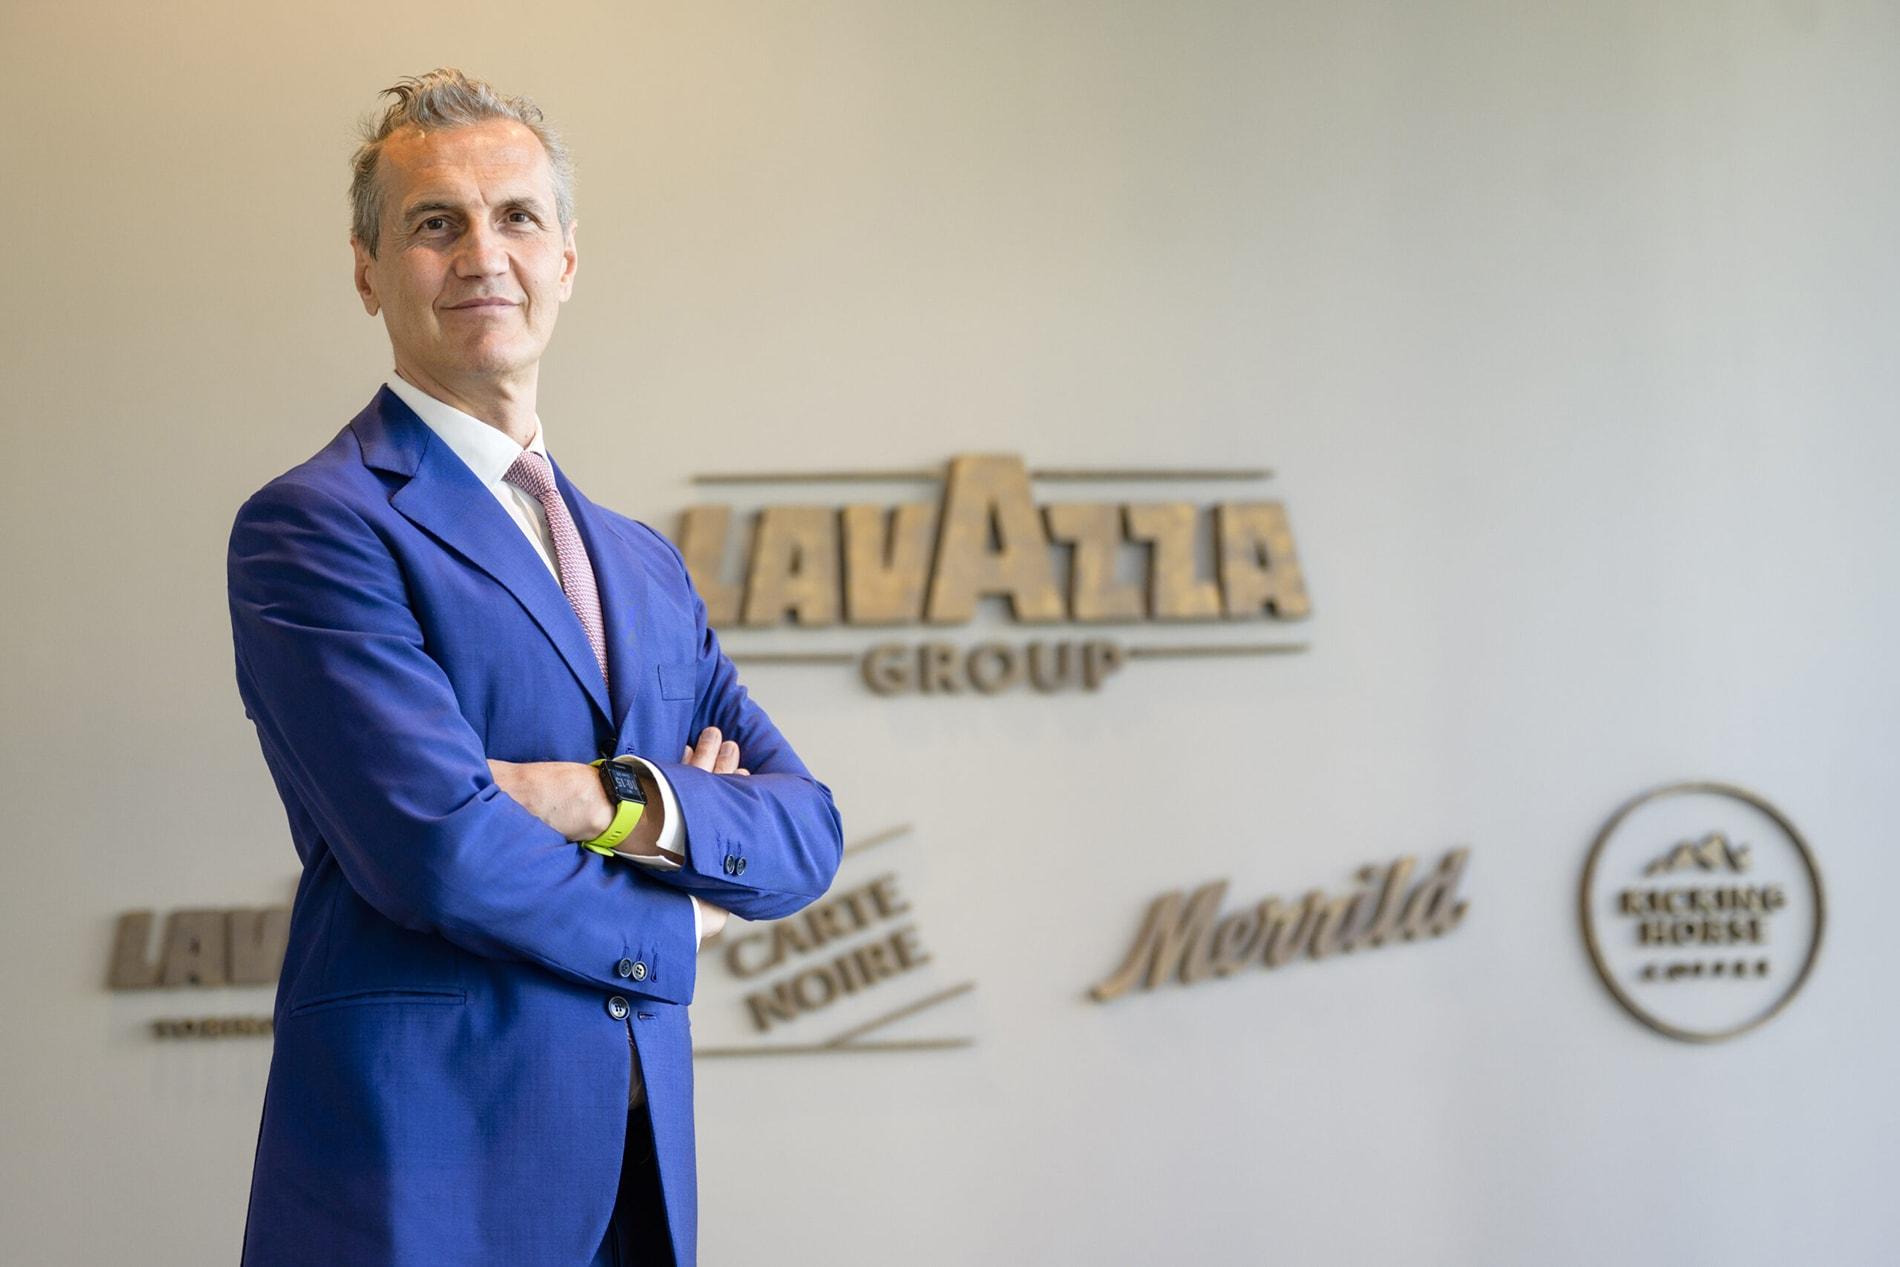 Lavazza Group в 2020 году заработала 2 миллиарда евро. На что потратят